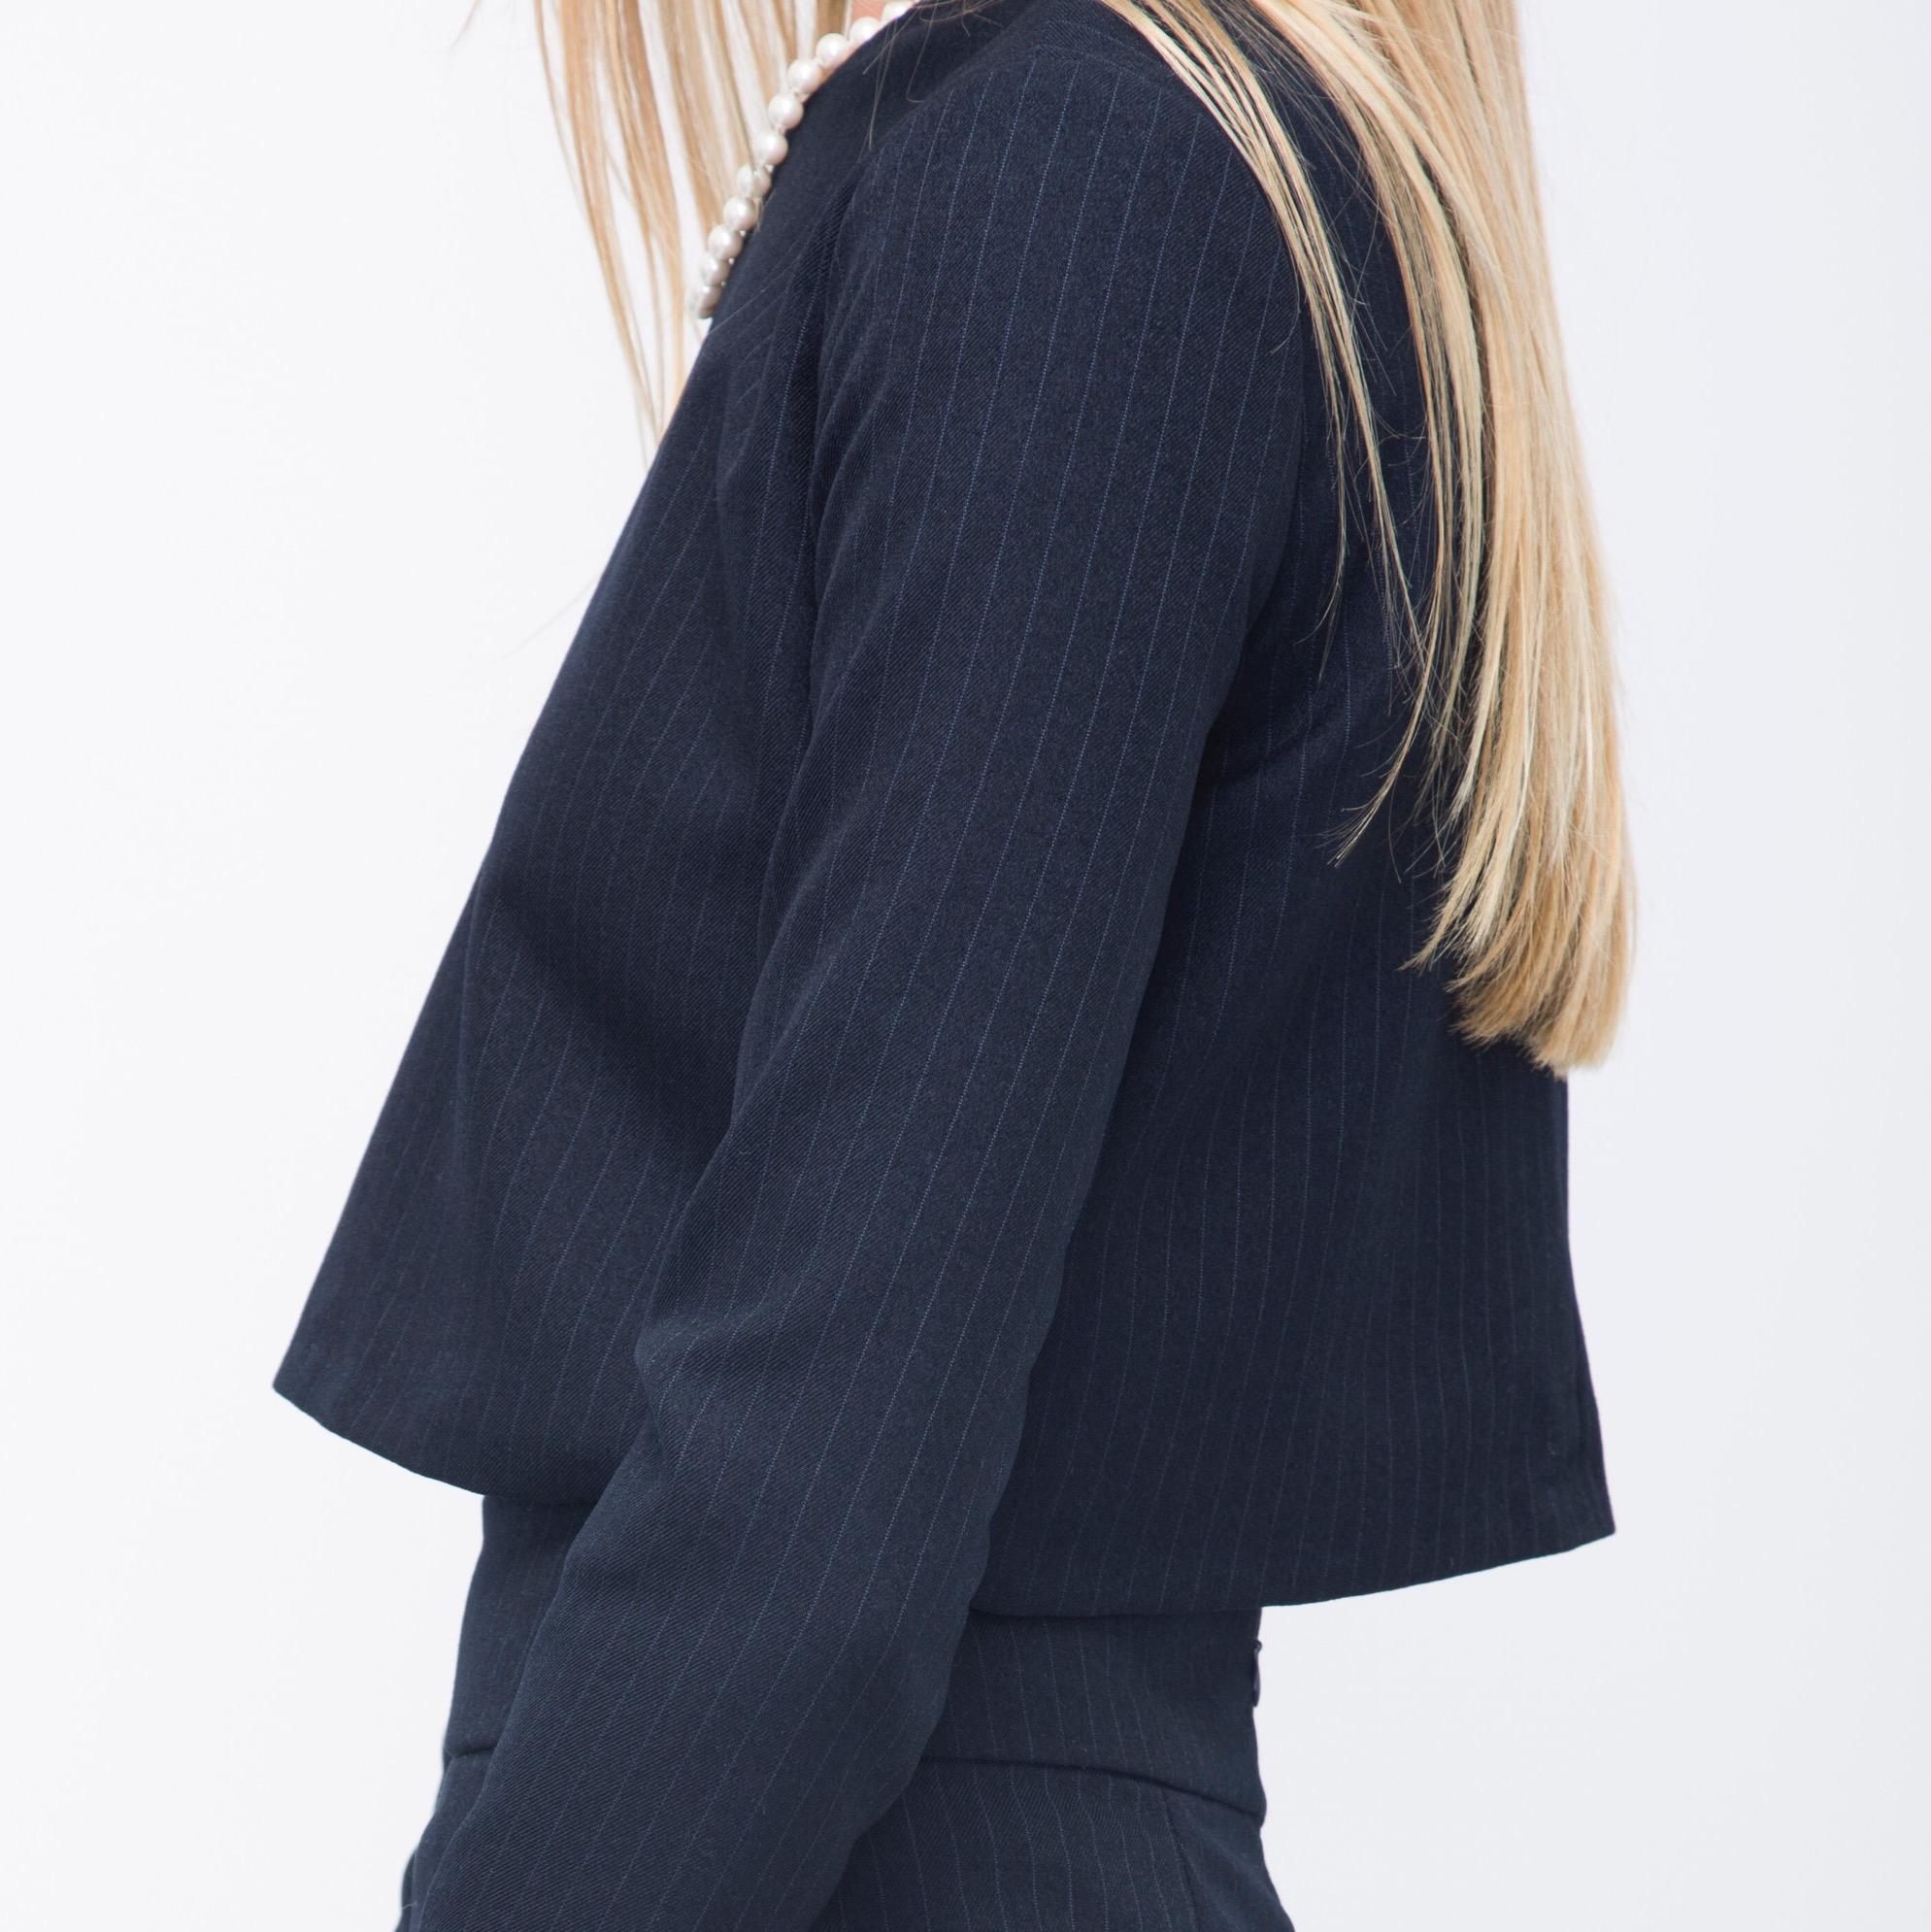 NATIA ERIN Femi Crop Top + Pencil Skirt